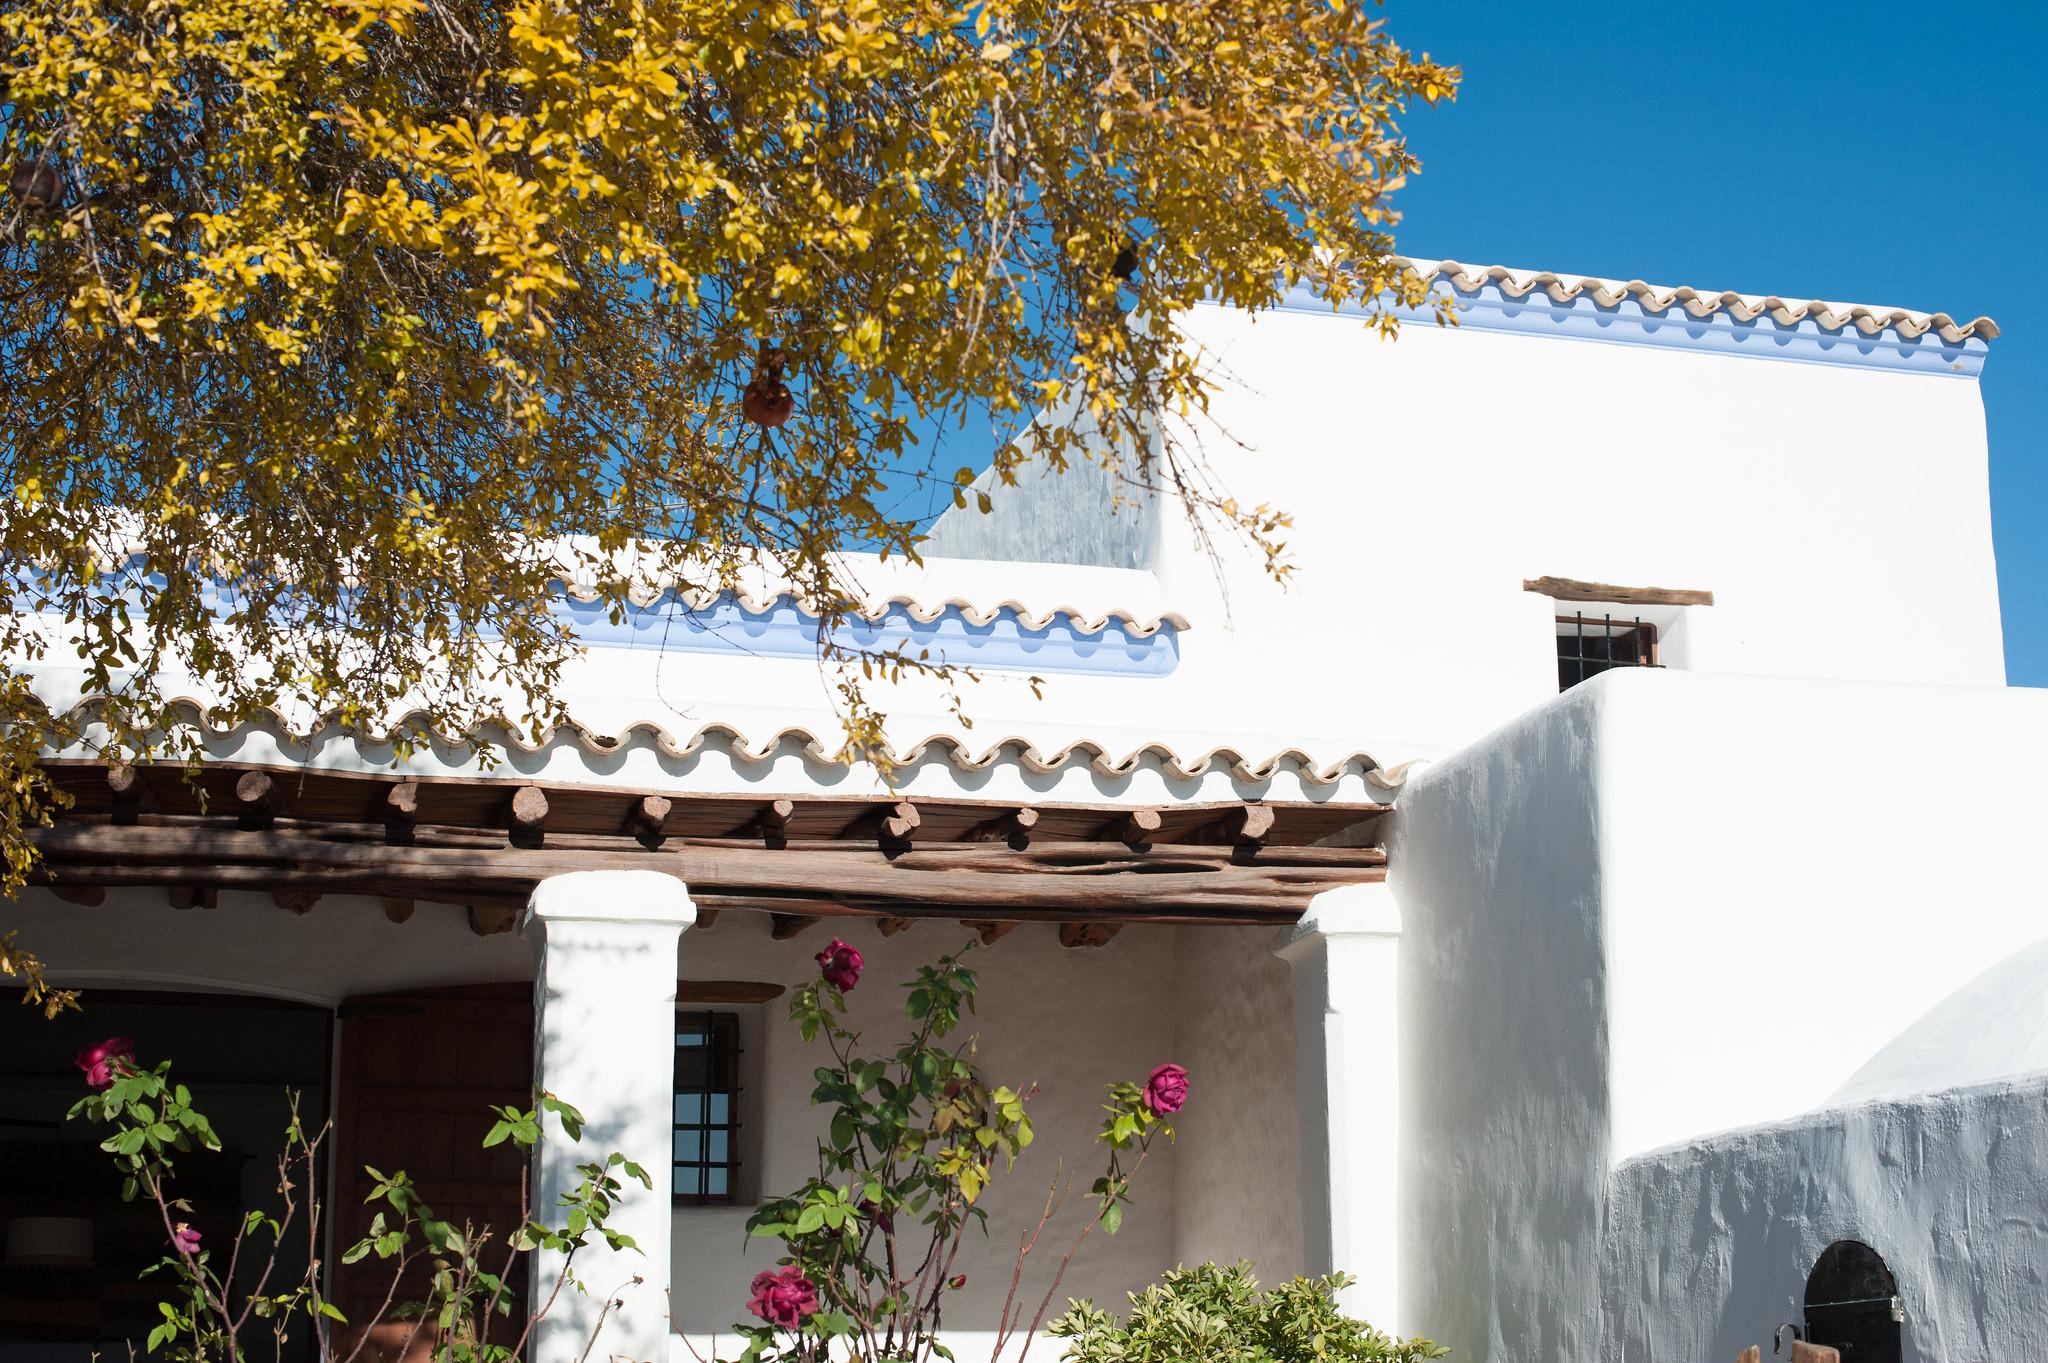 https://www.white-ibiza.com/wp-content/uploads/2020/05/white-ibiza-villas-canblay-finca-exterior.jpg